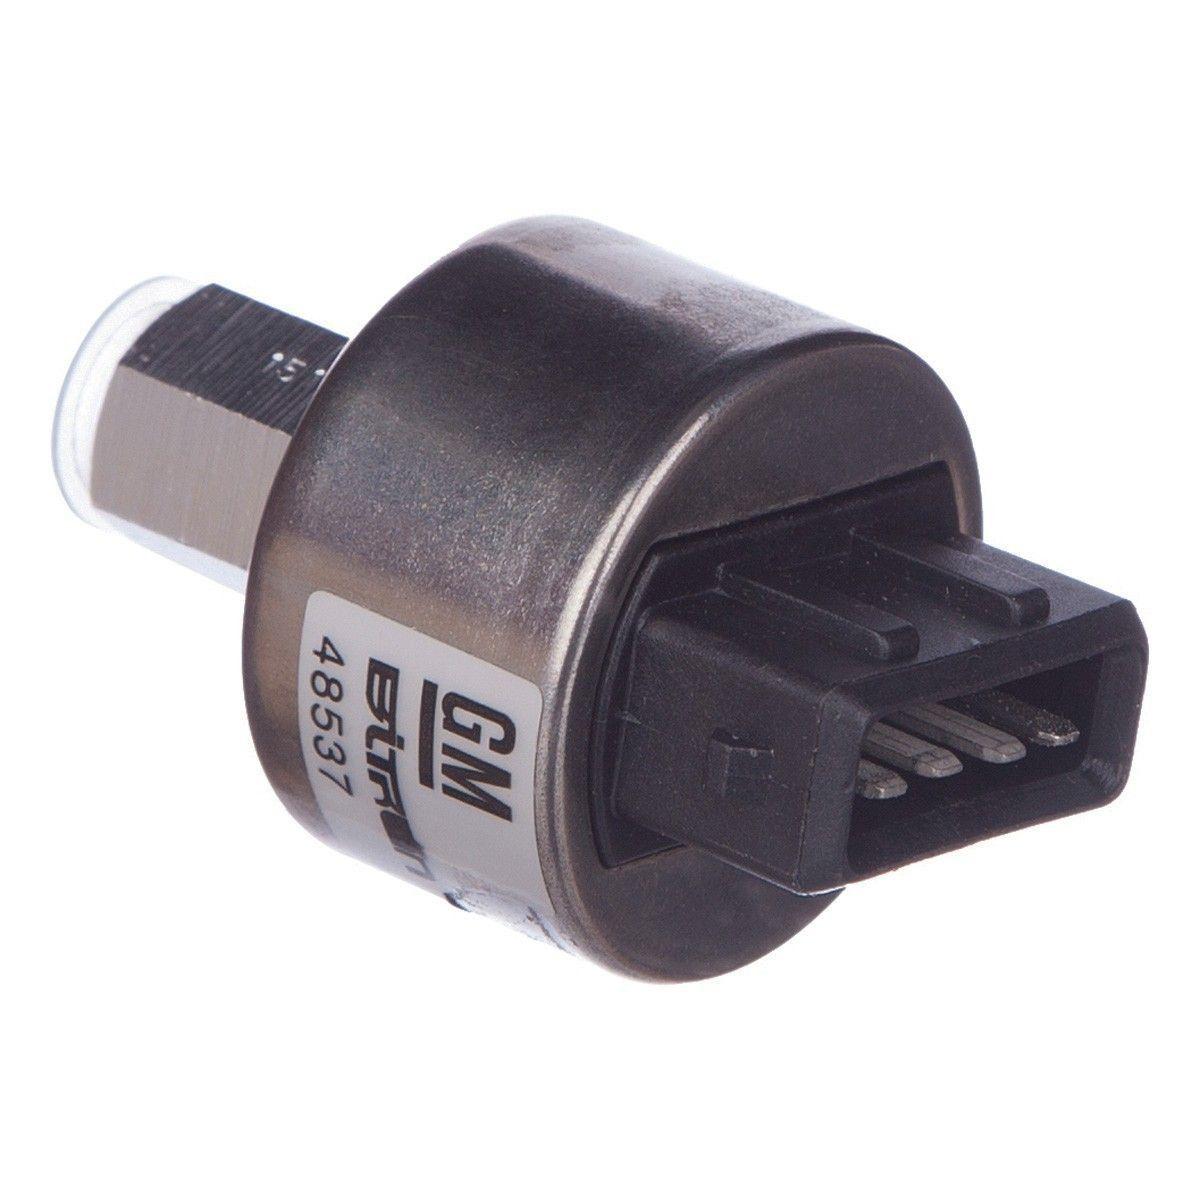 Interruptor pressostato ar condicionado - Calibra de 1994 a 1996